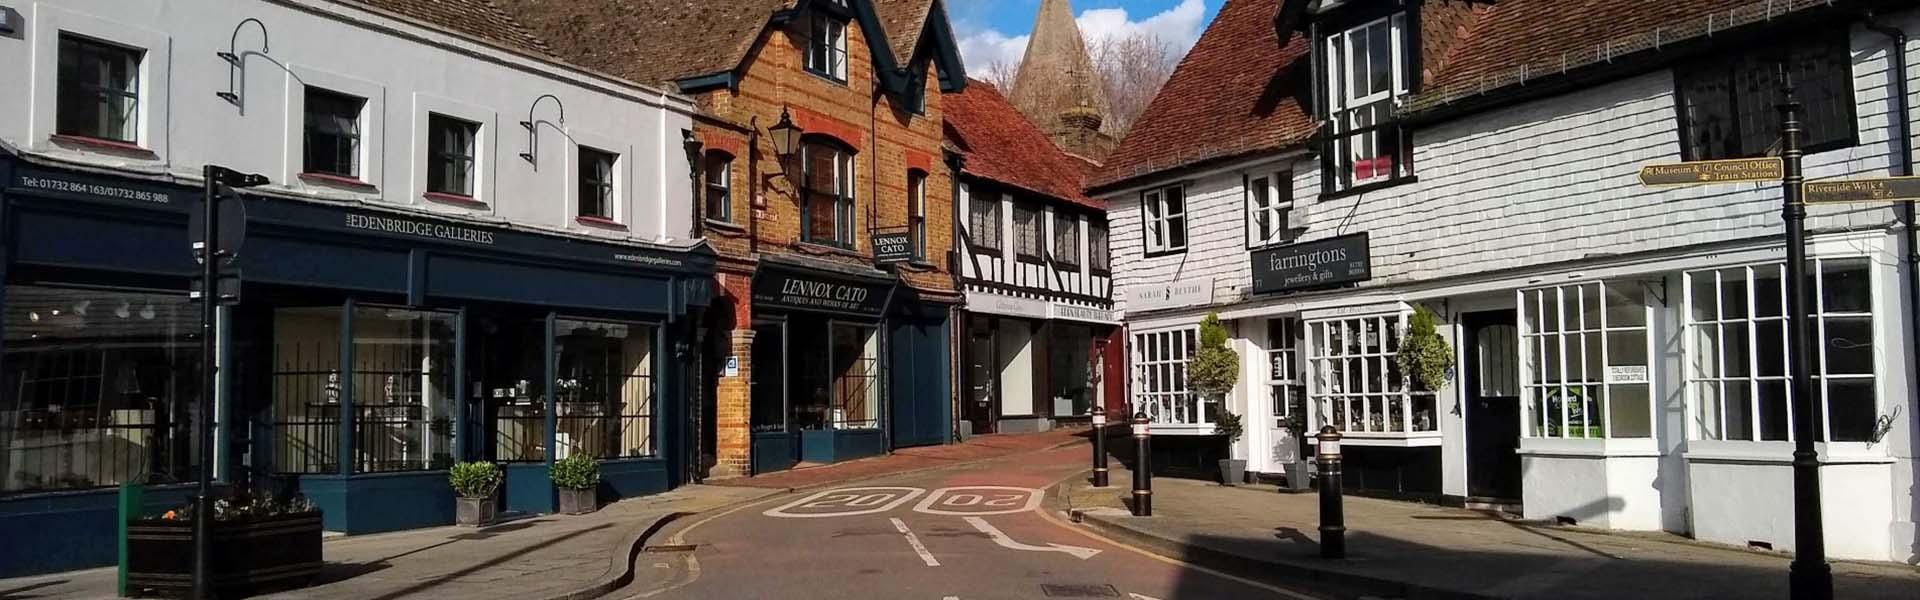 Church Street Edenbridge